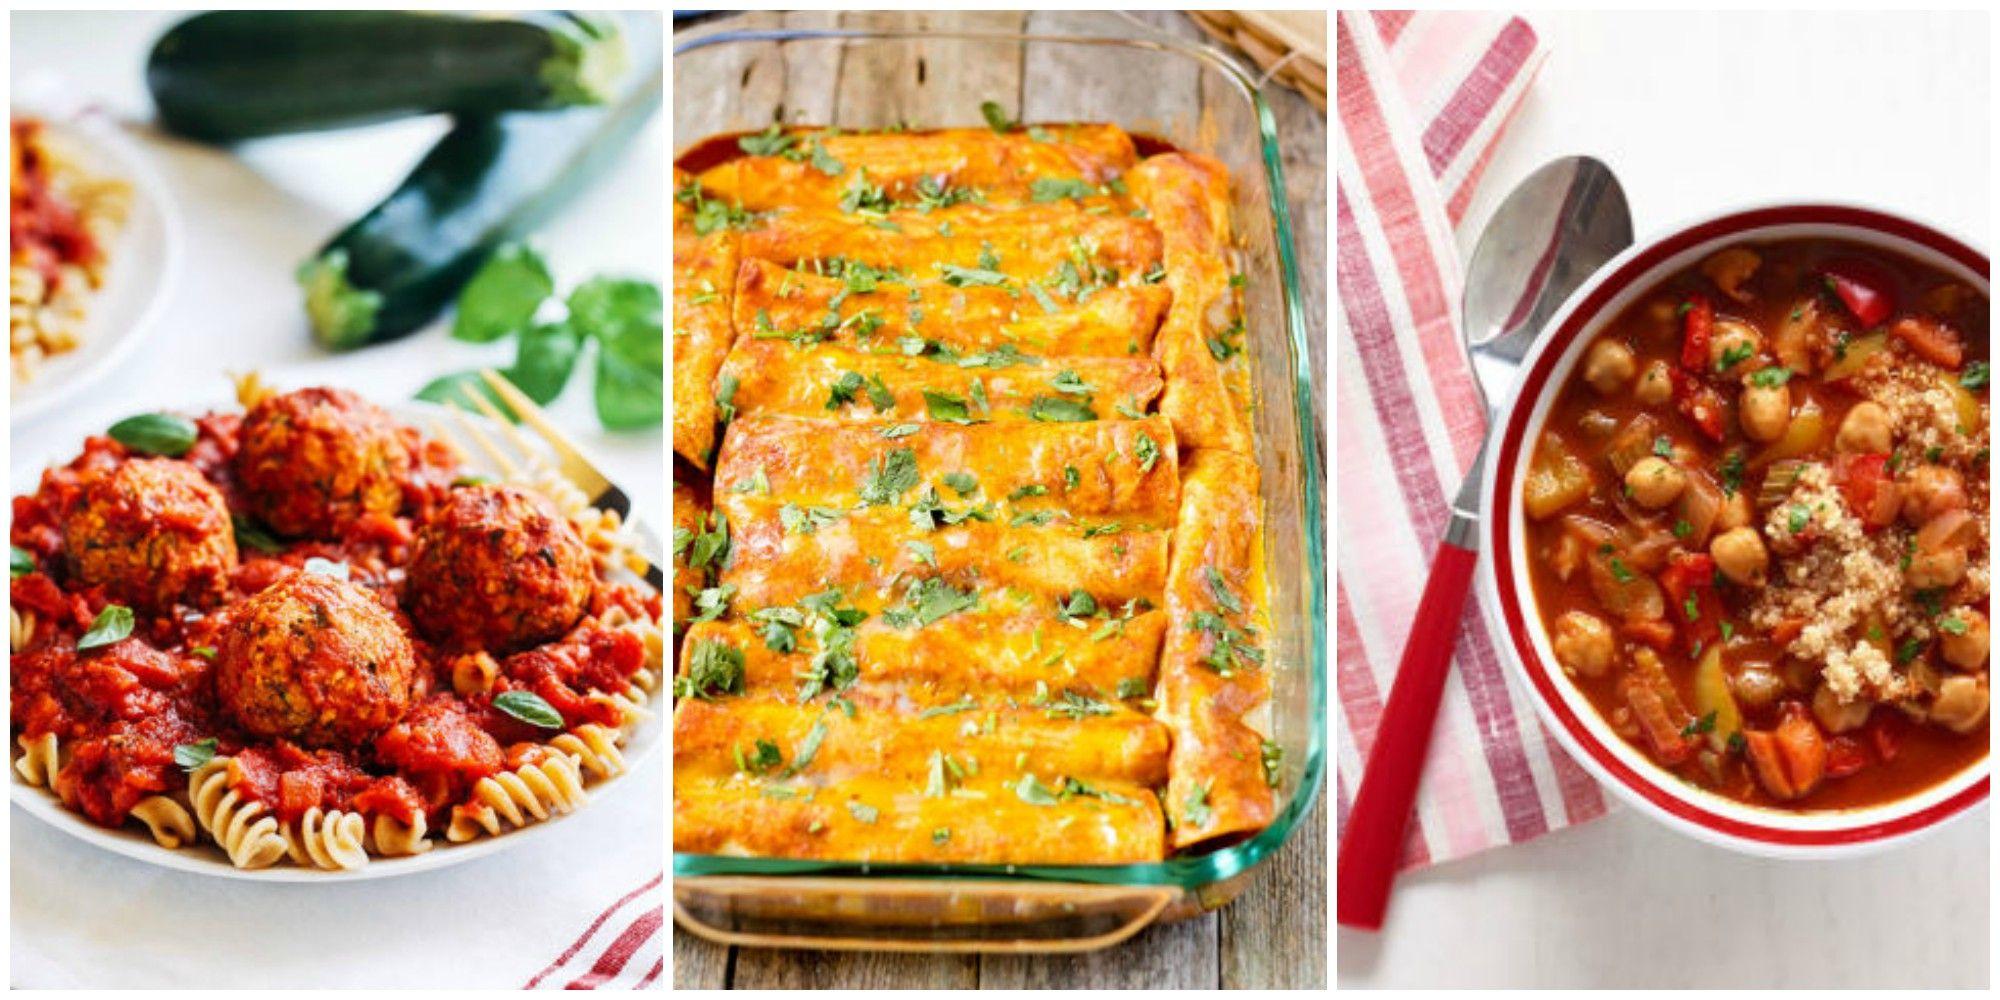 10 easy vegan dinner recipes best vegan meal ideas forumfinder Images